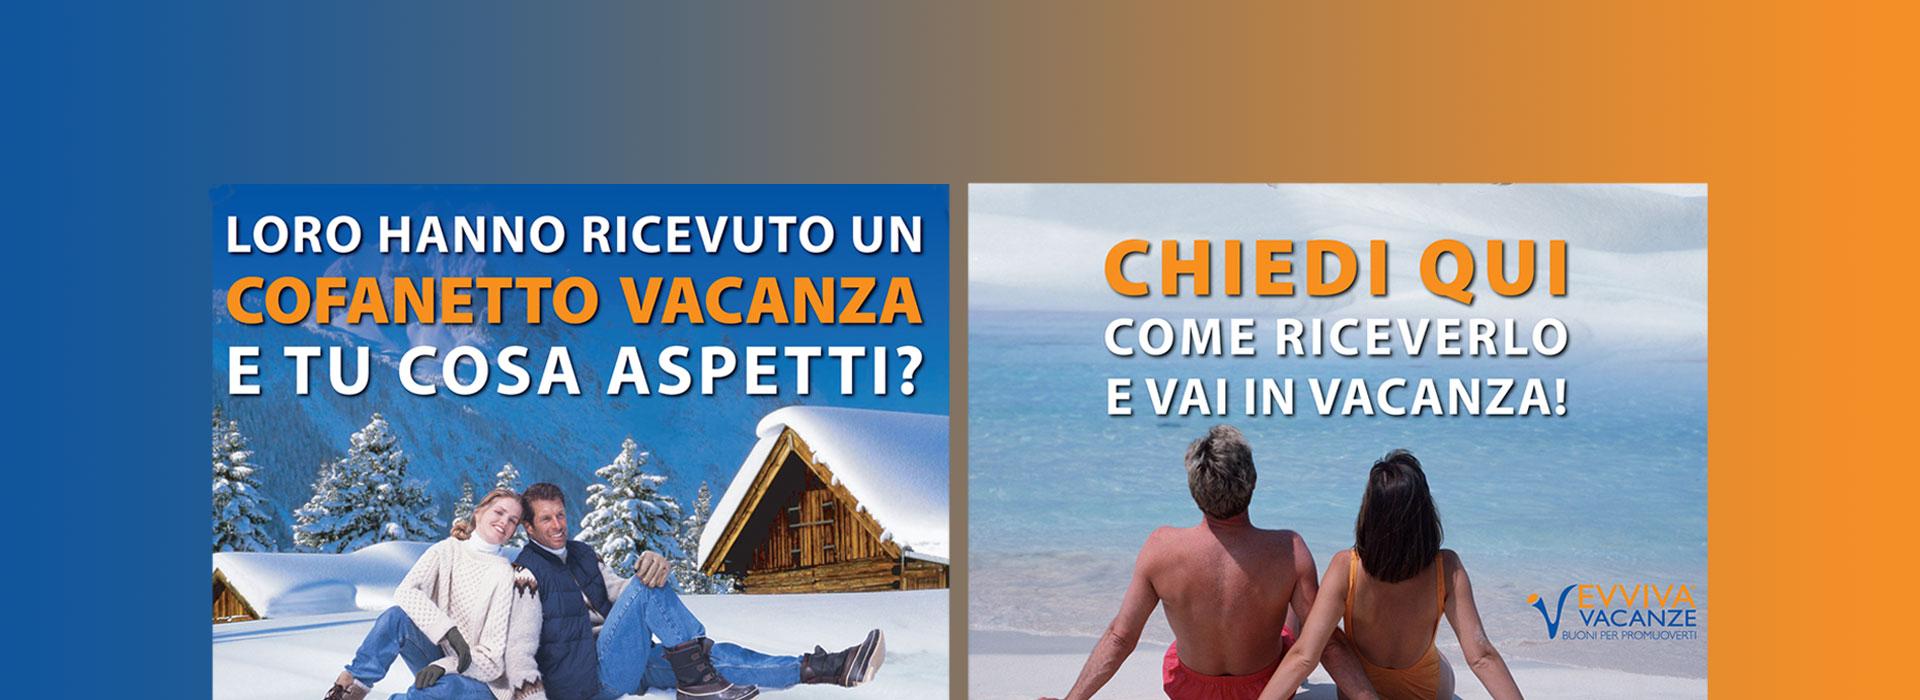 Slide-Promo-Vacanza.jpg